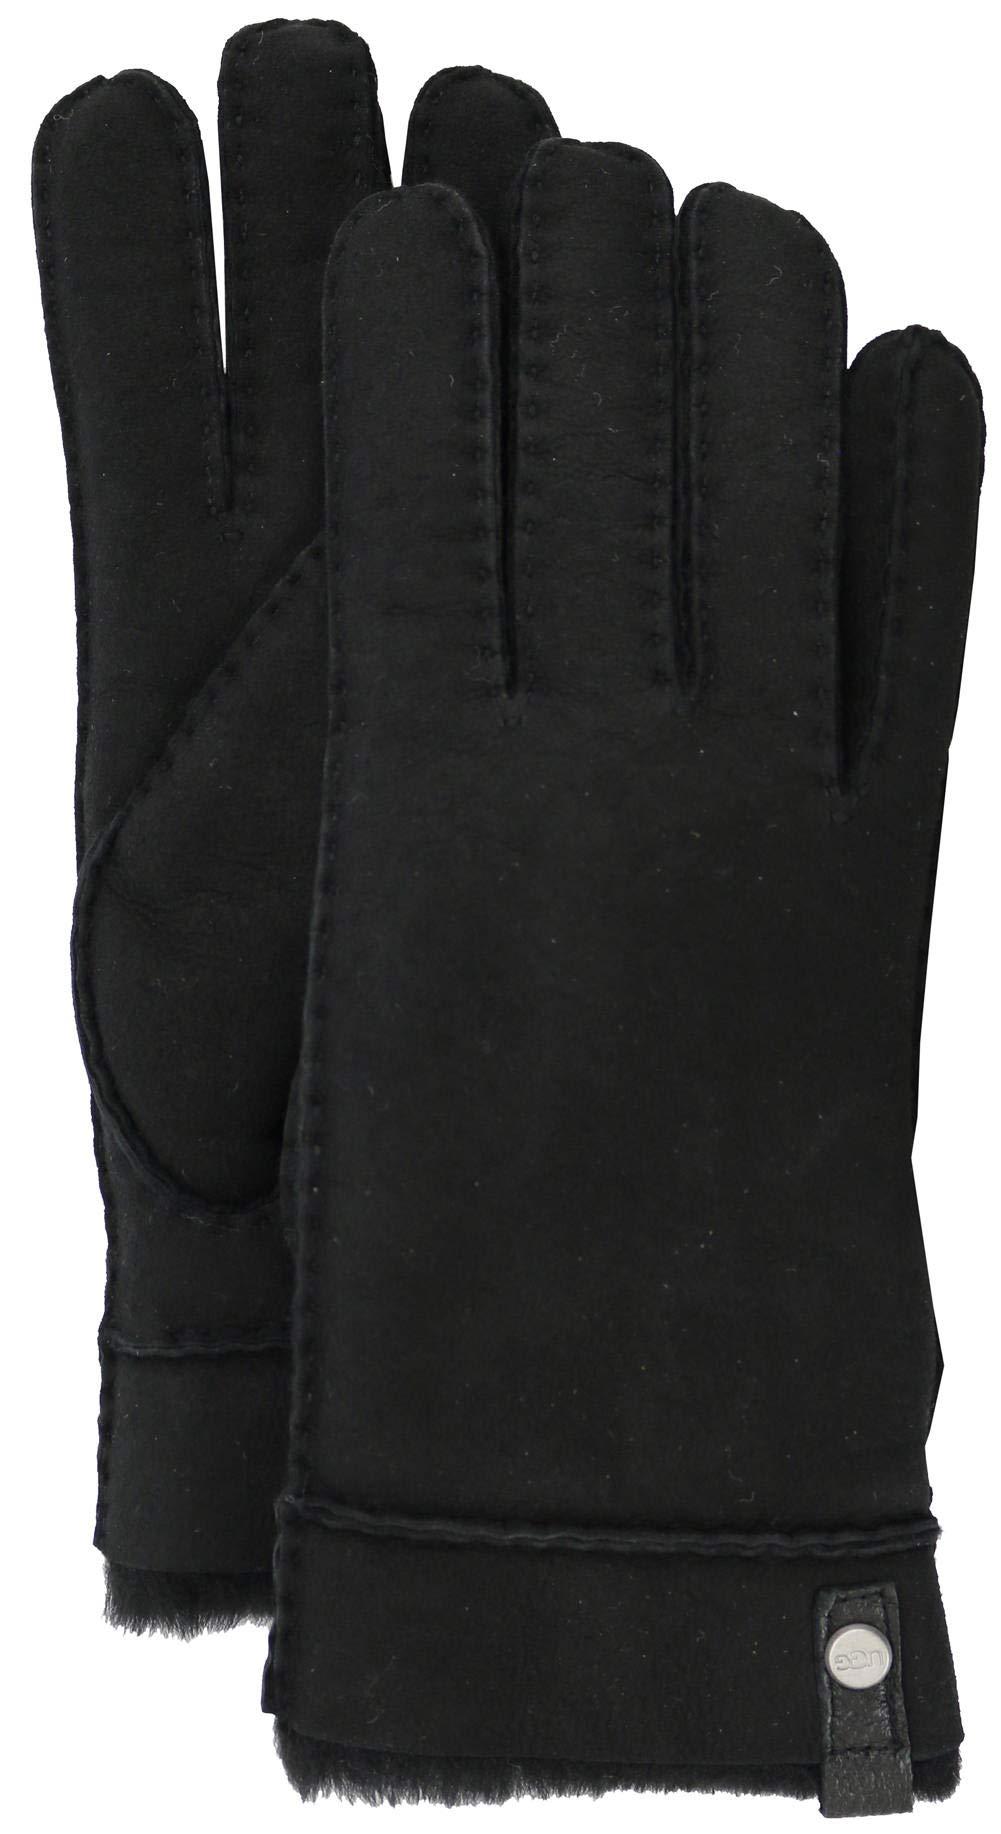 UGG Women's W Tenney Glove, Black, s by UGG (Image #1)